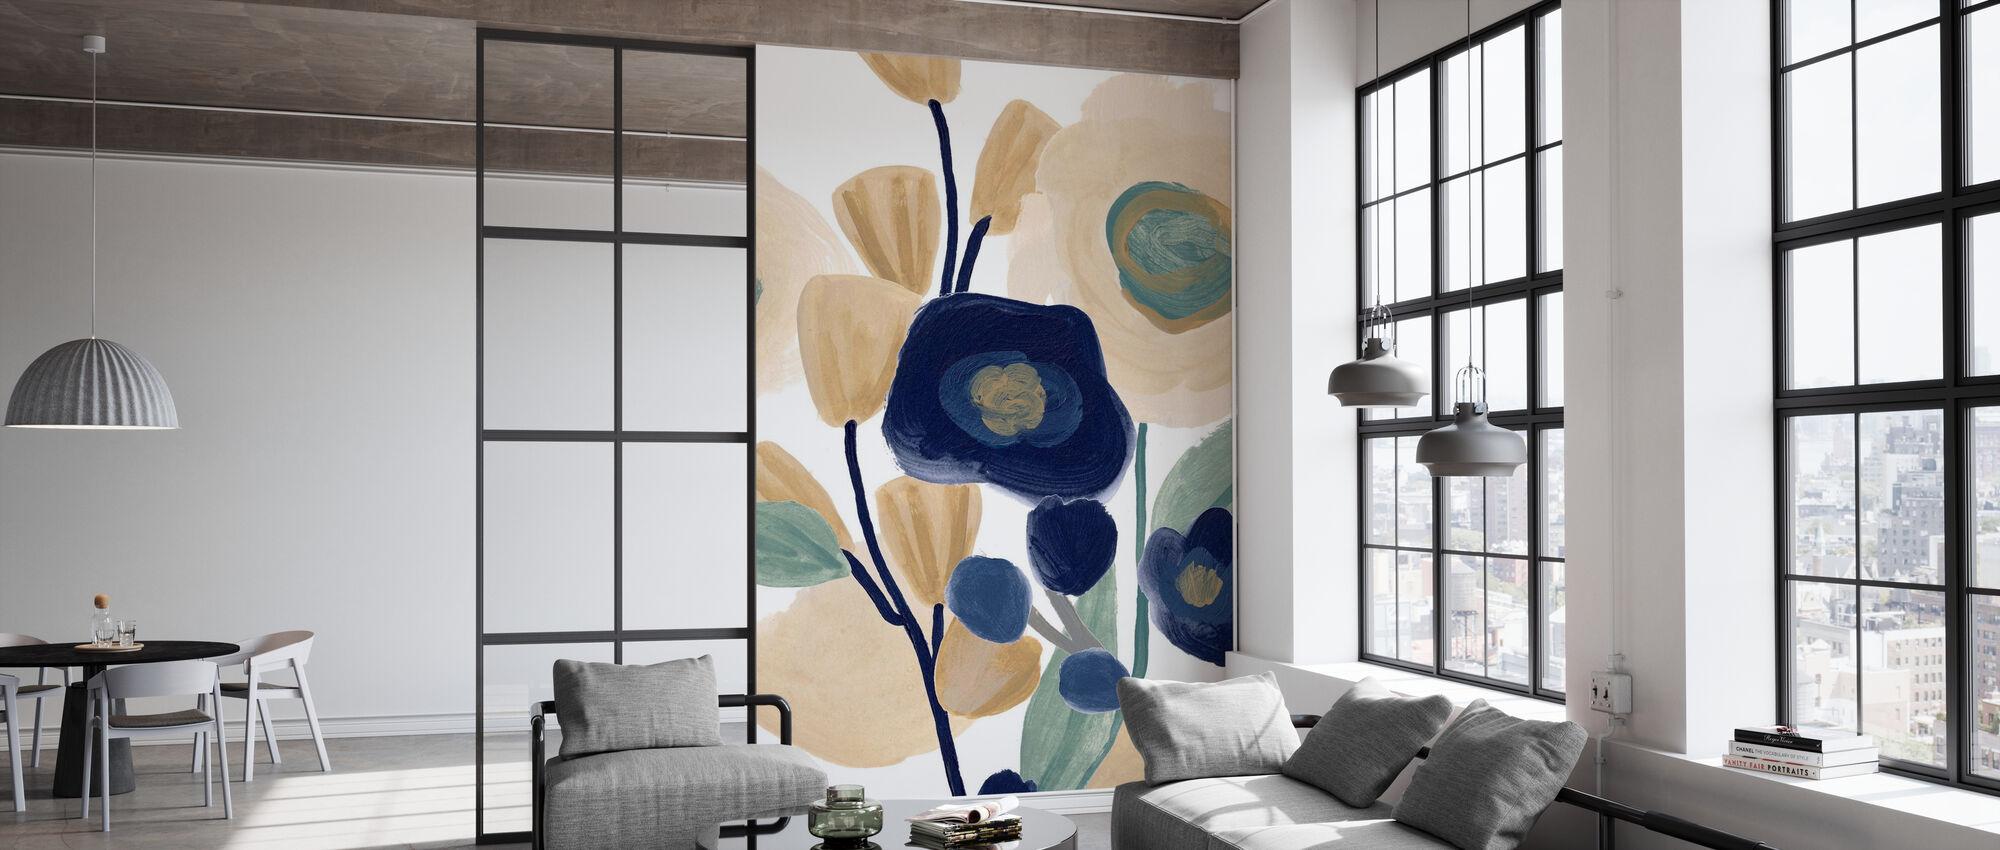 Blue Poppy Cascade - Wallpaper - Office